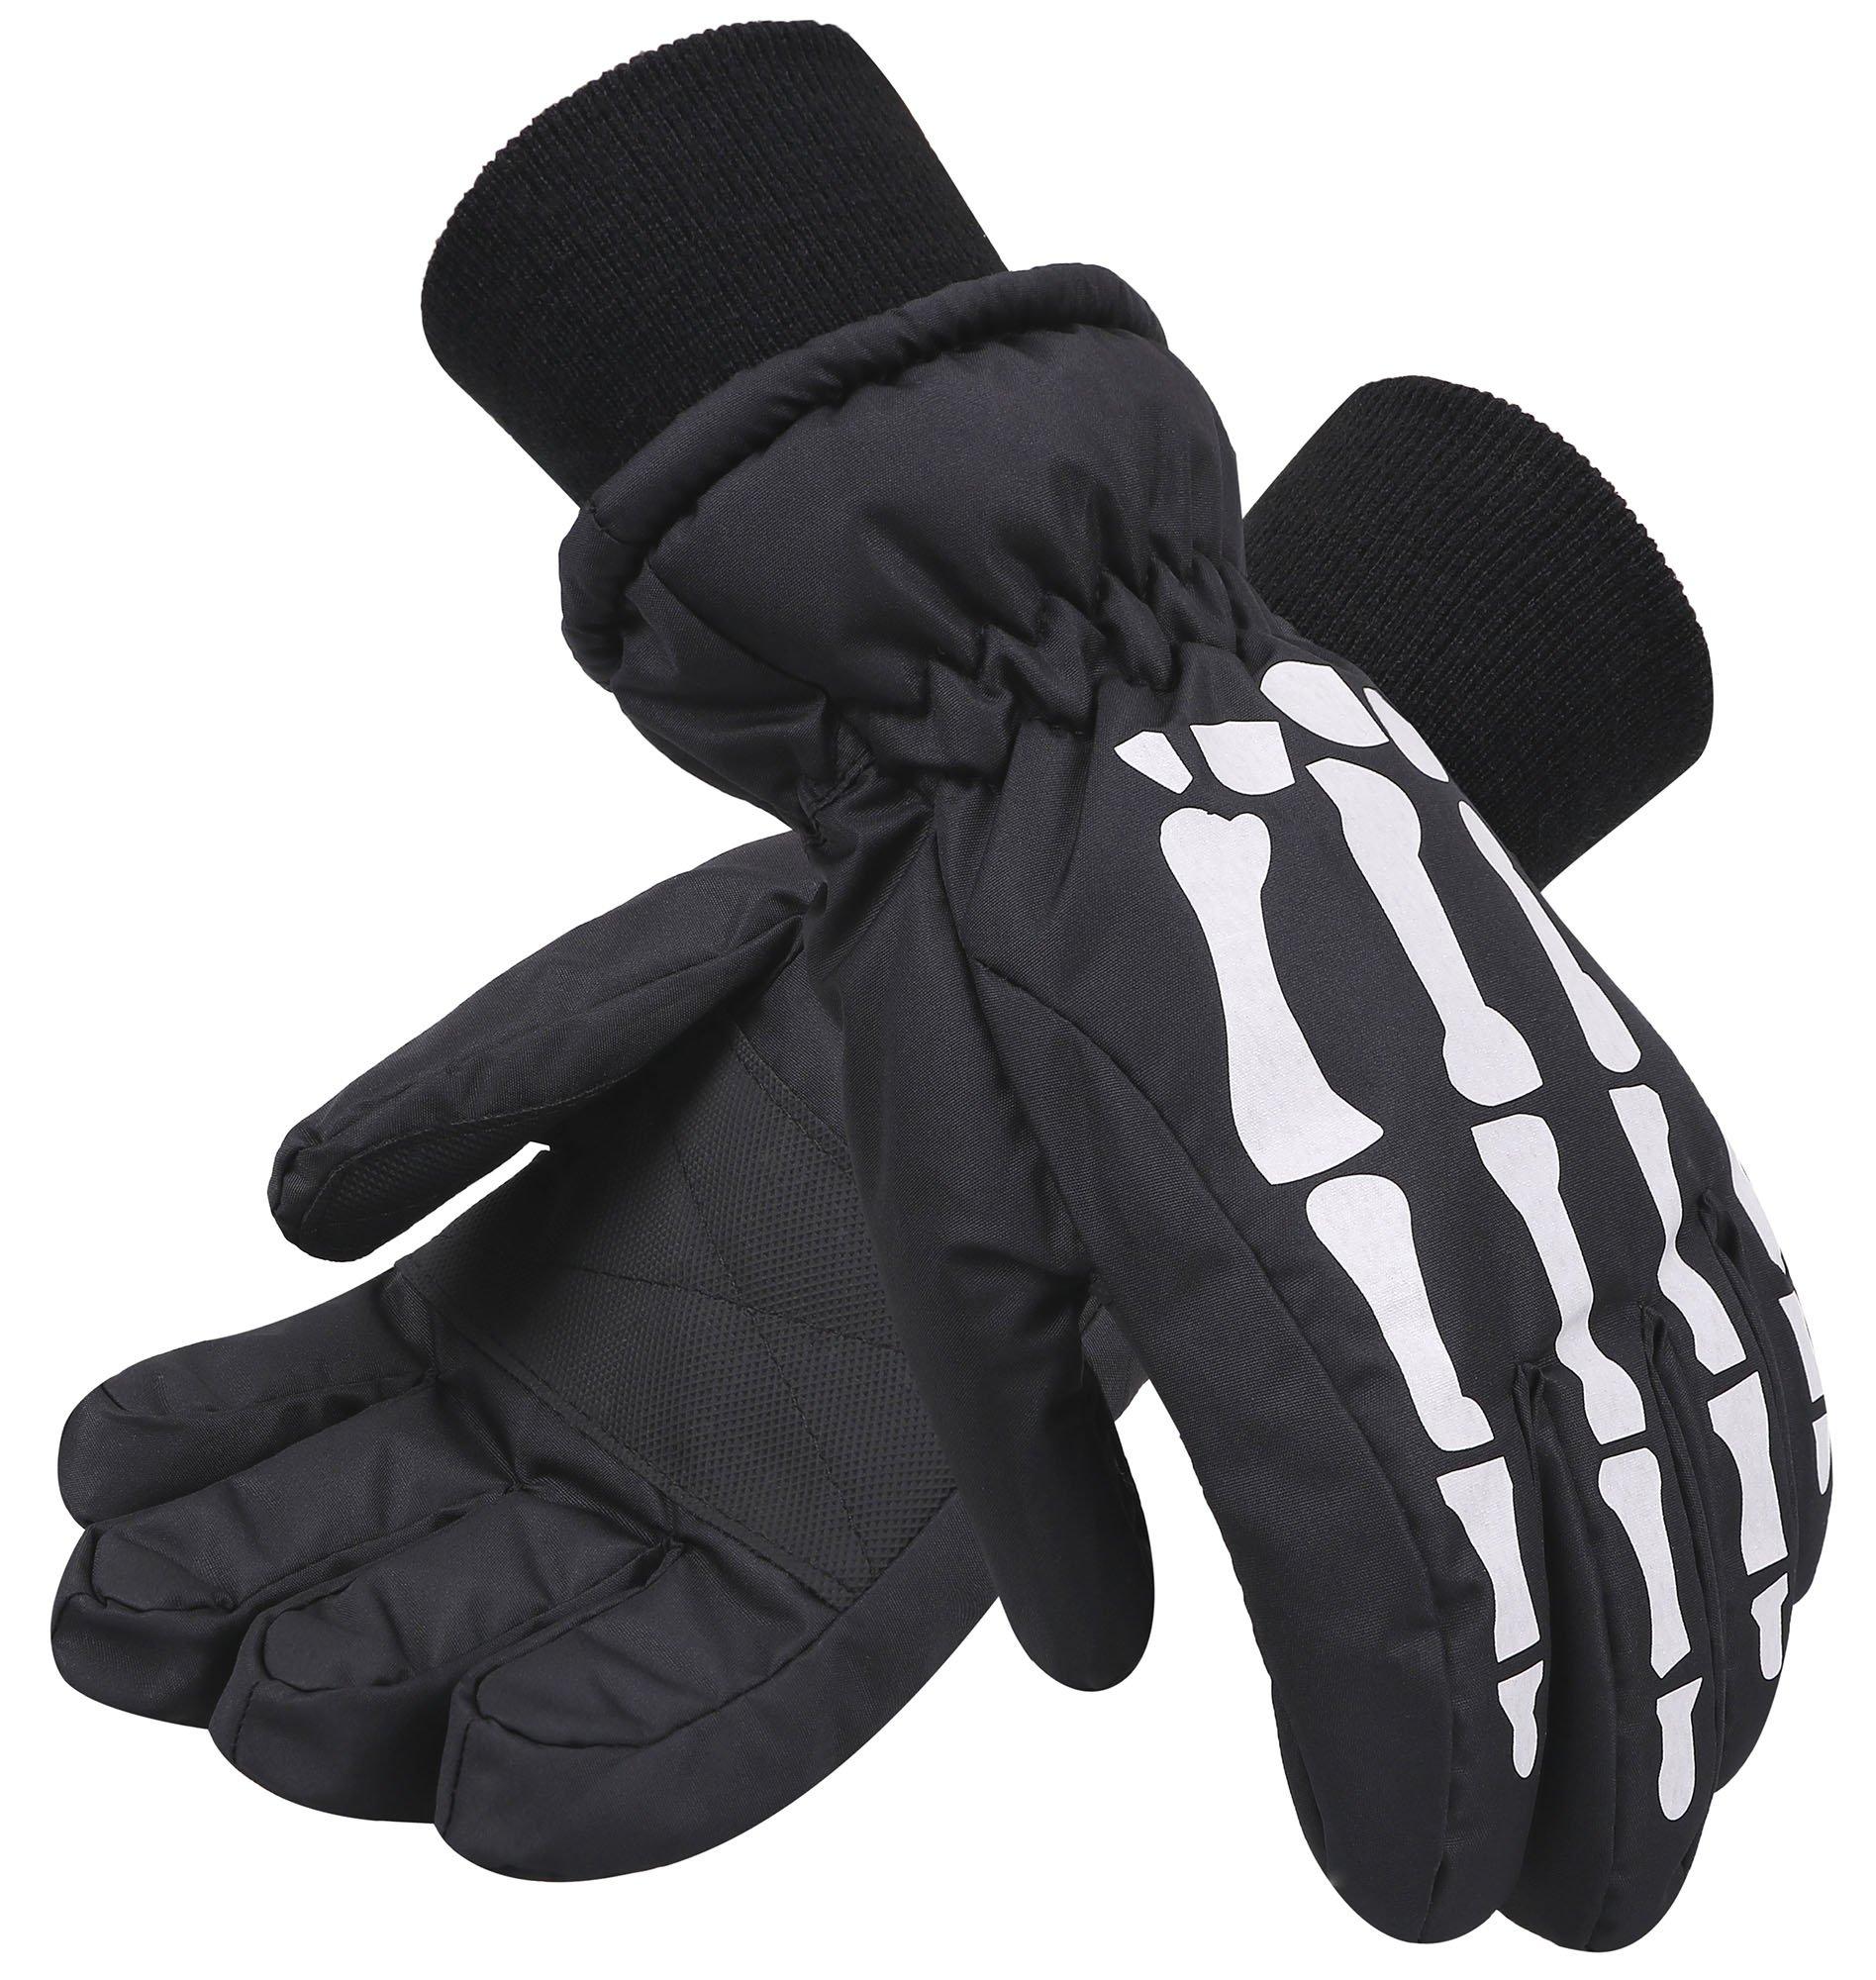 AbbyLexi Kids Boy's & Girl's Winter Thinsulate Lined Ski & Snowboard Gloves